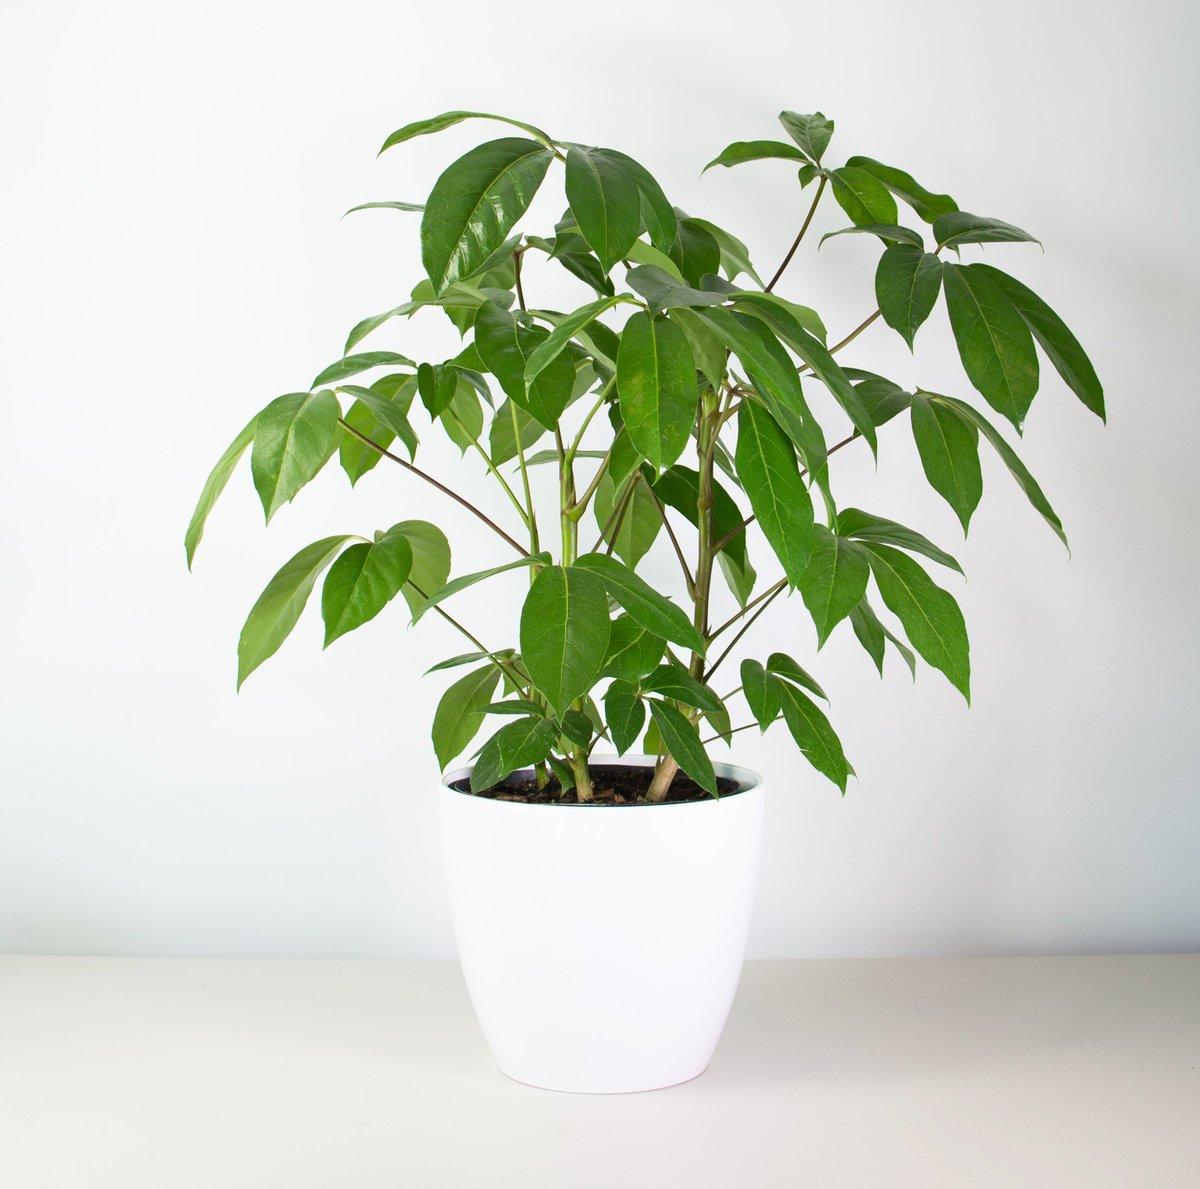 Schefflera Amate Plant And Pot Nz